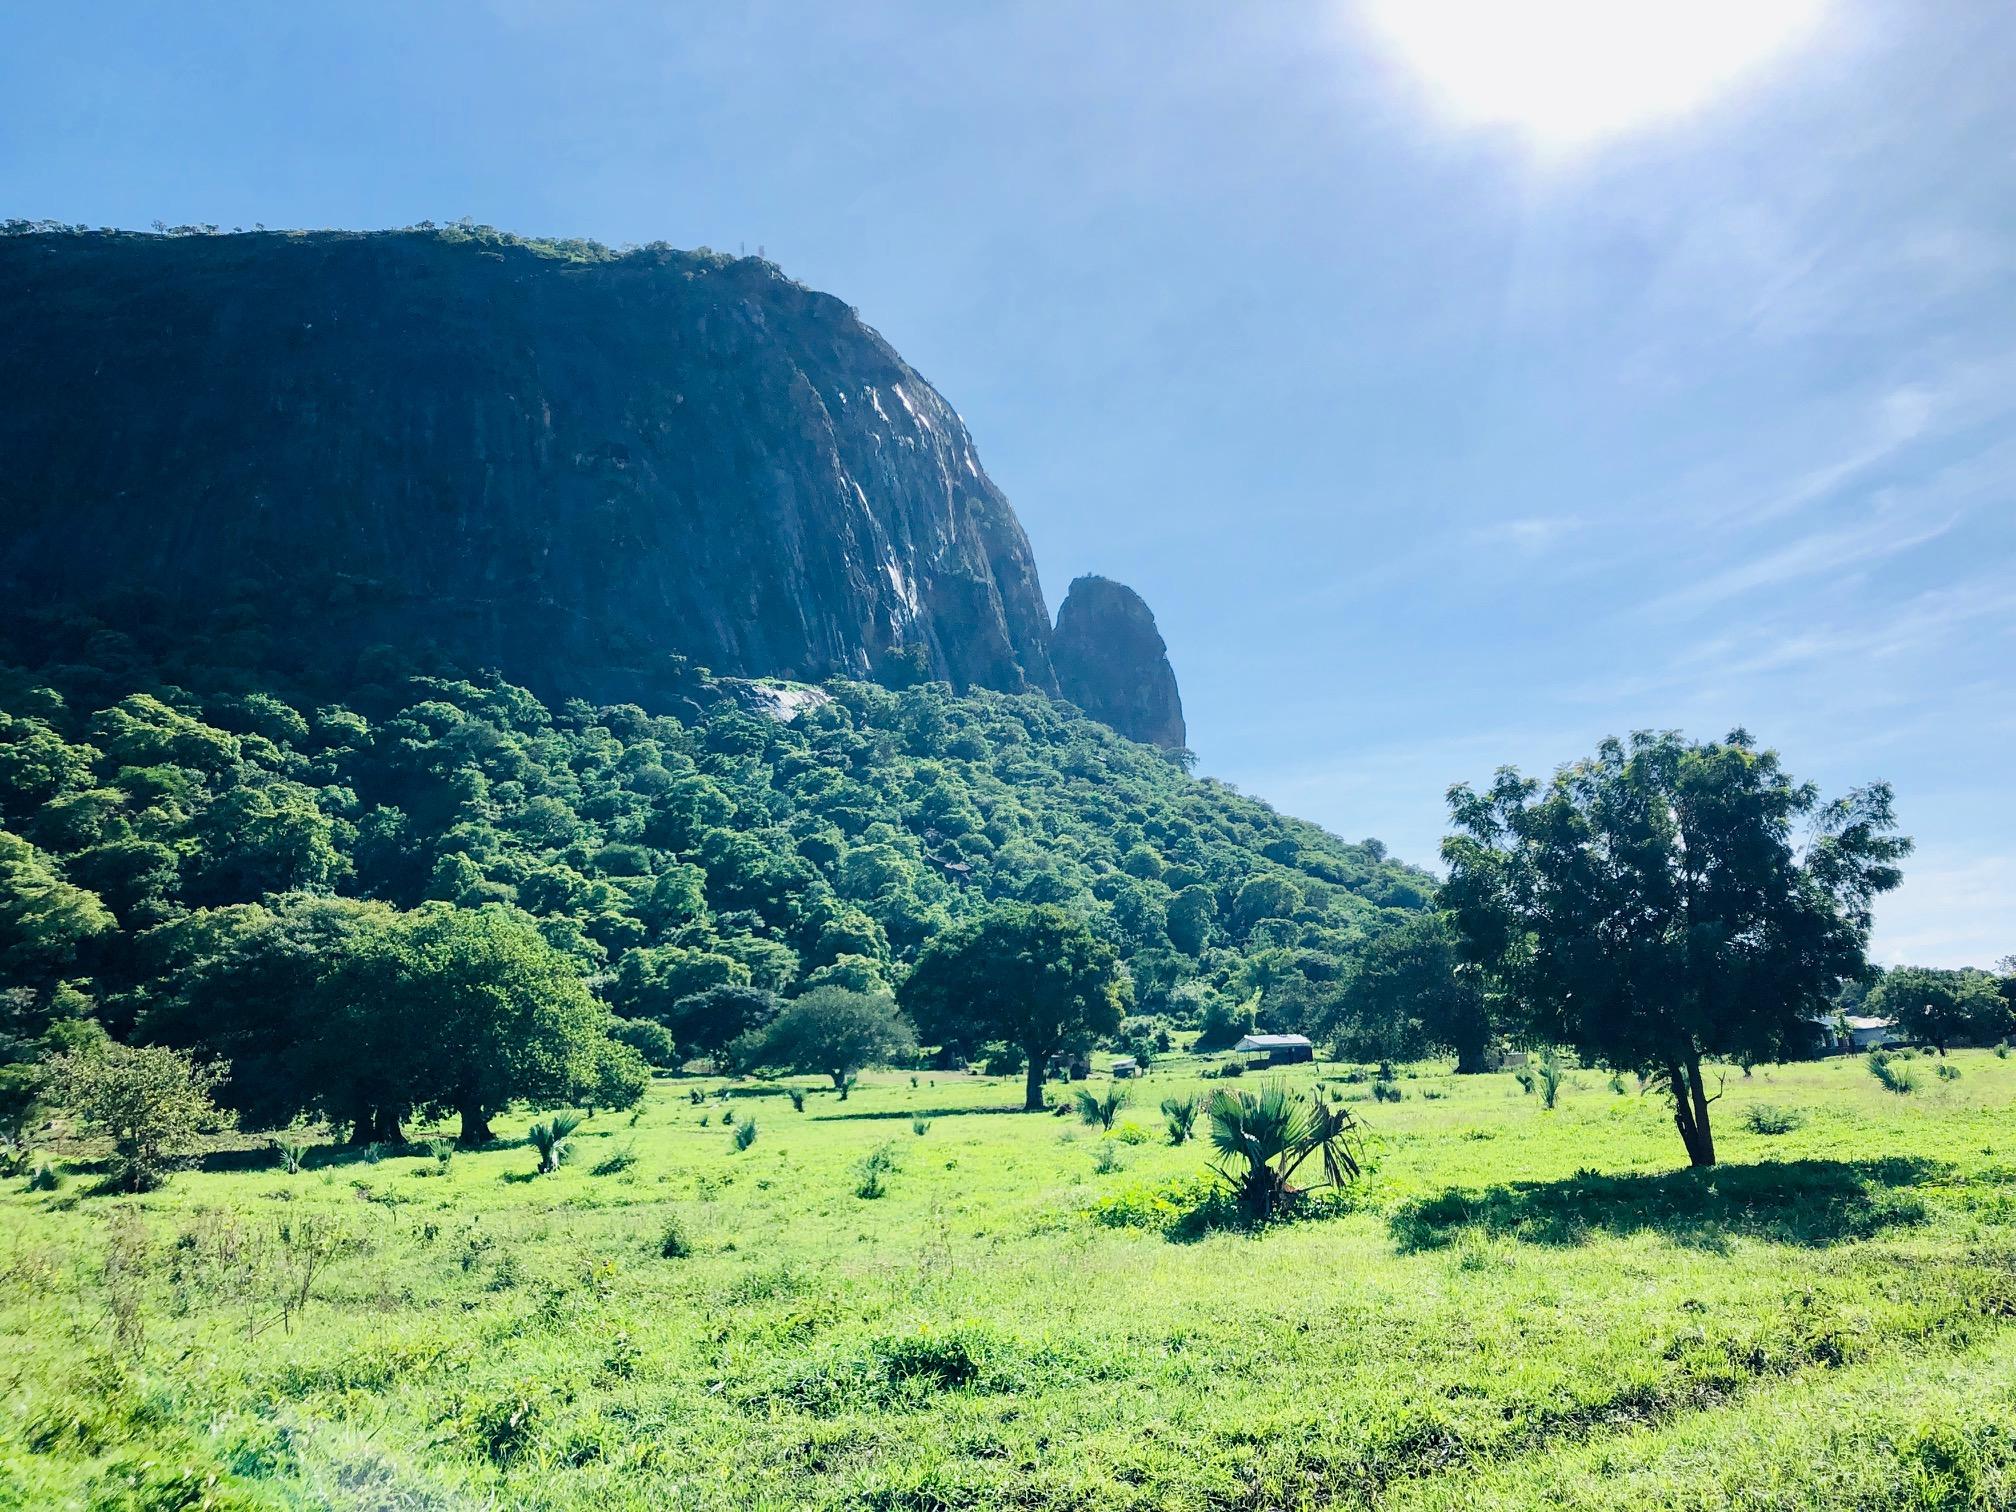 KALONGO UGANDA 29 MAY 2019